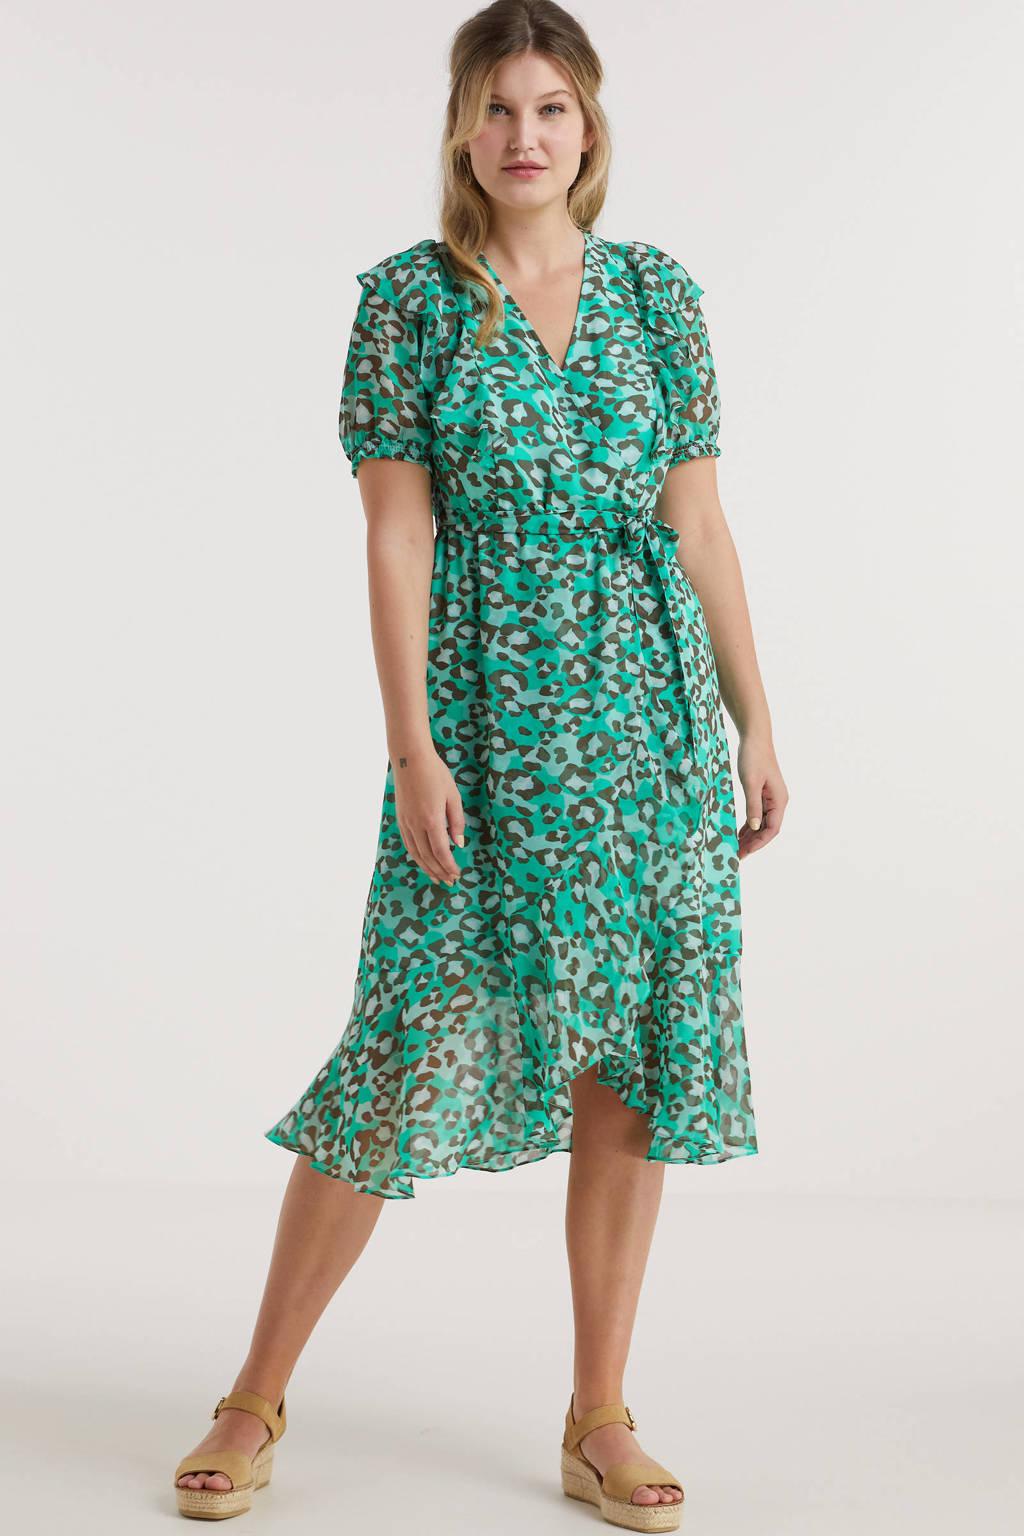 Miljuschka by Wehkamp wikkel-look jurk met ruches en panterprint groen, Groen/mint/zwart